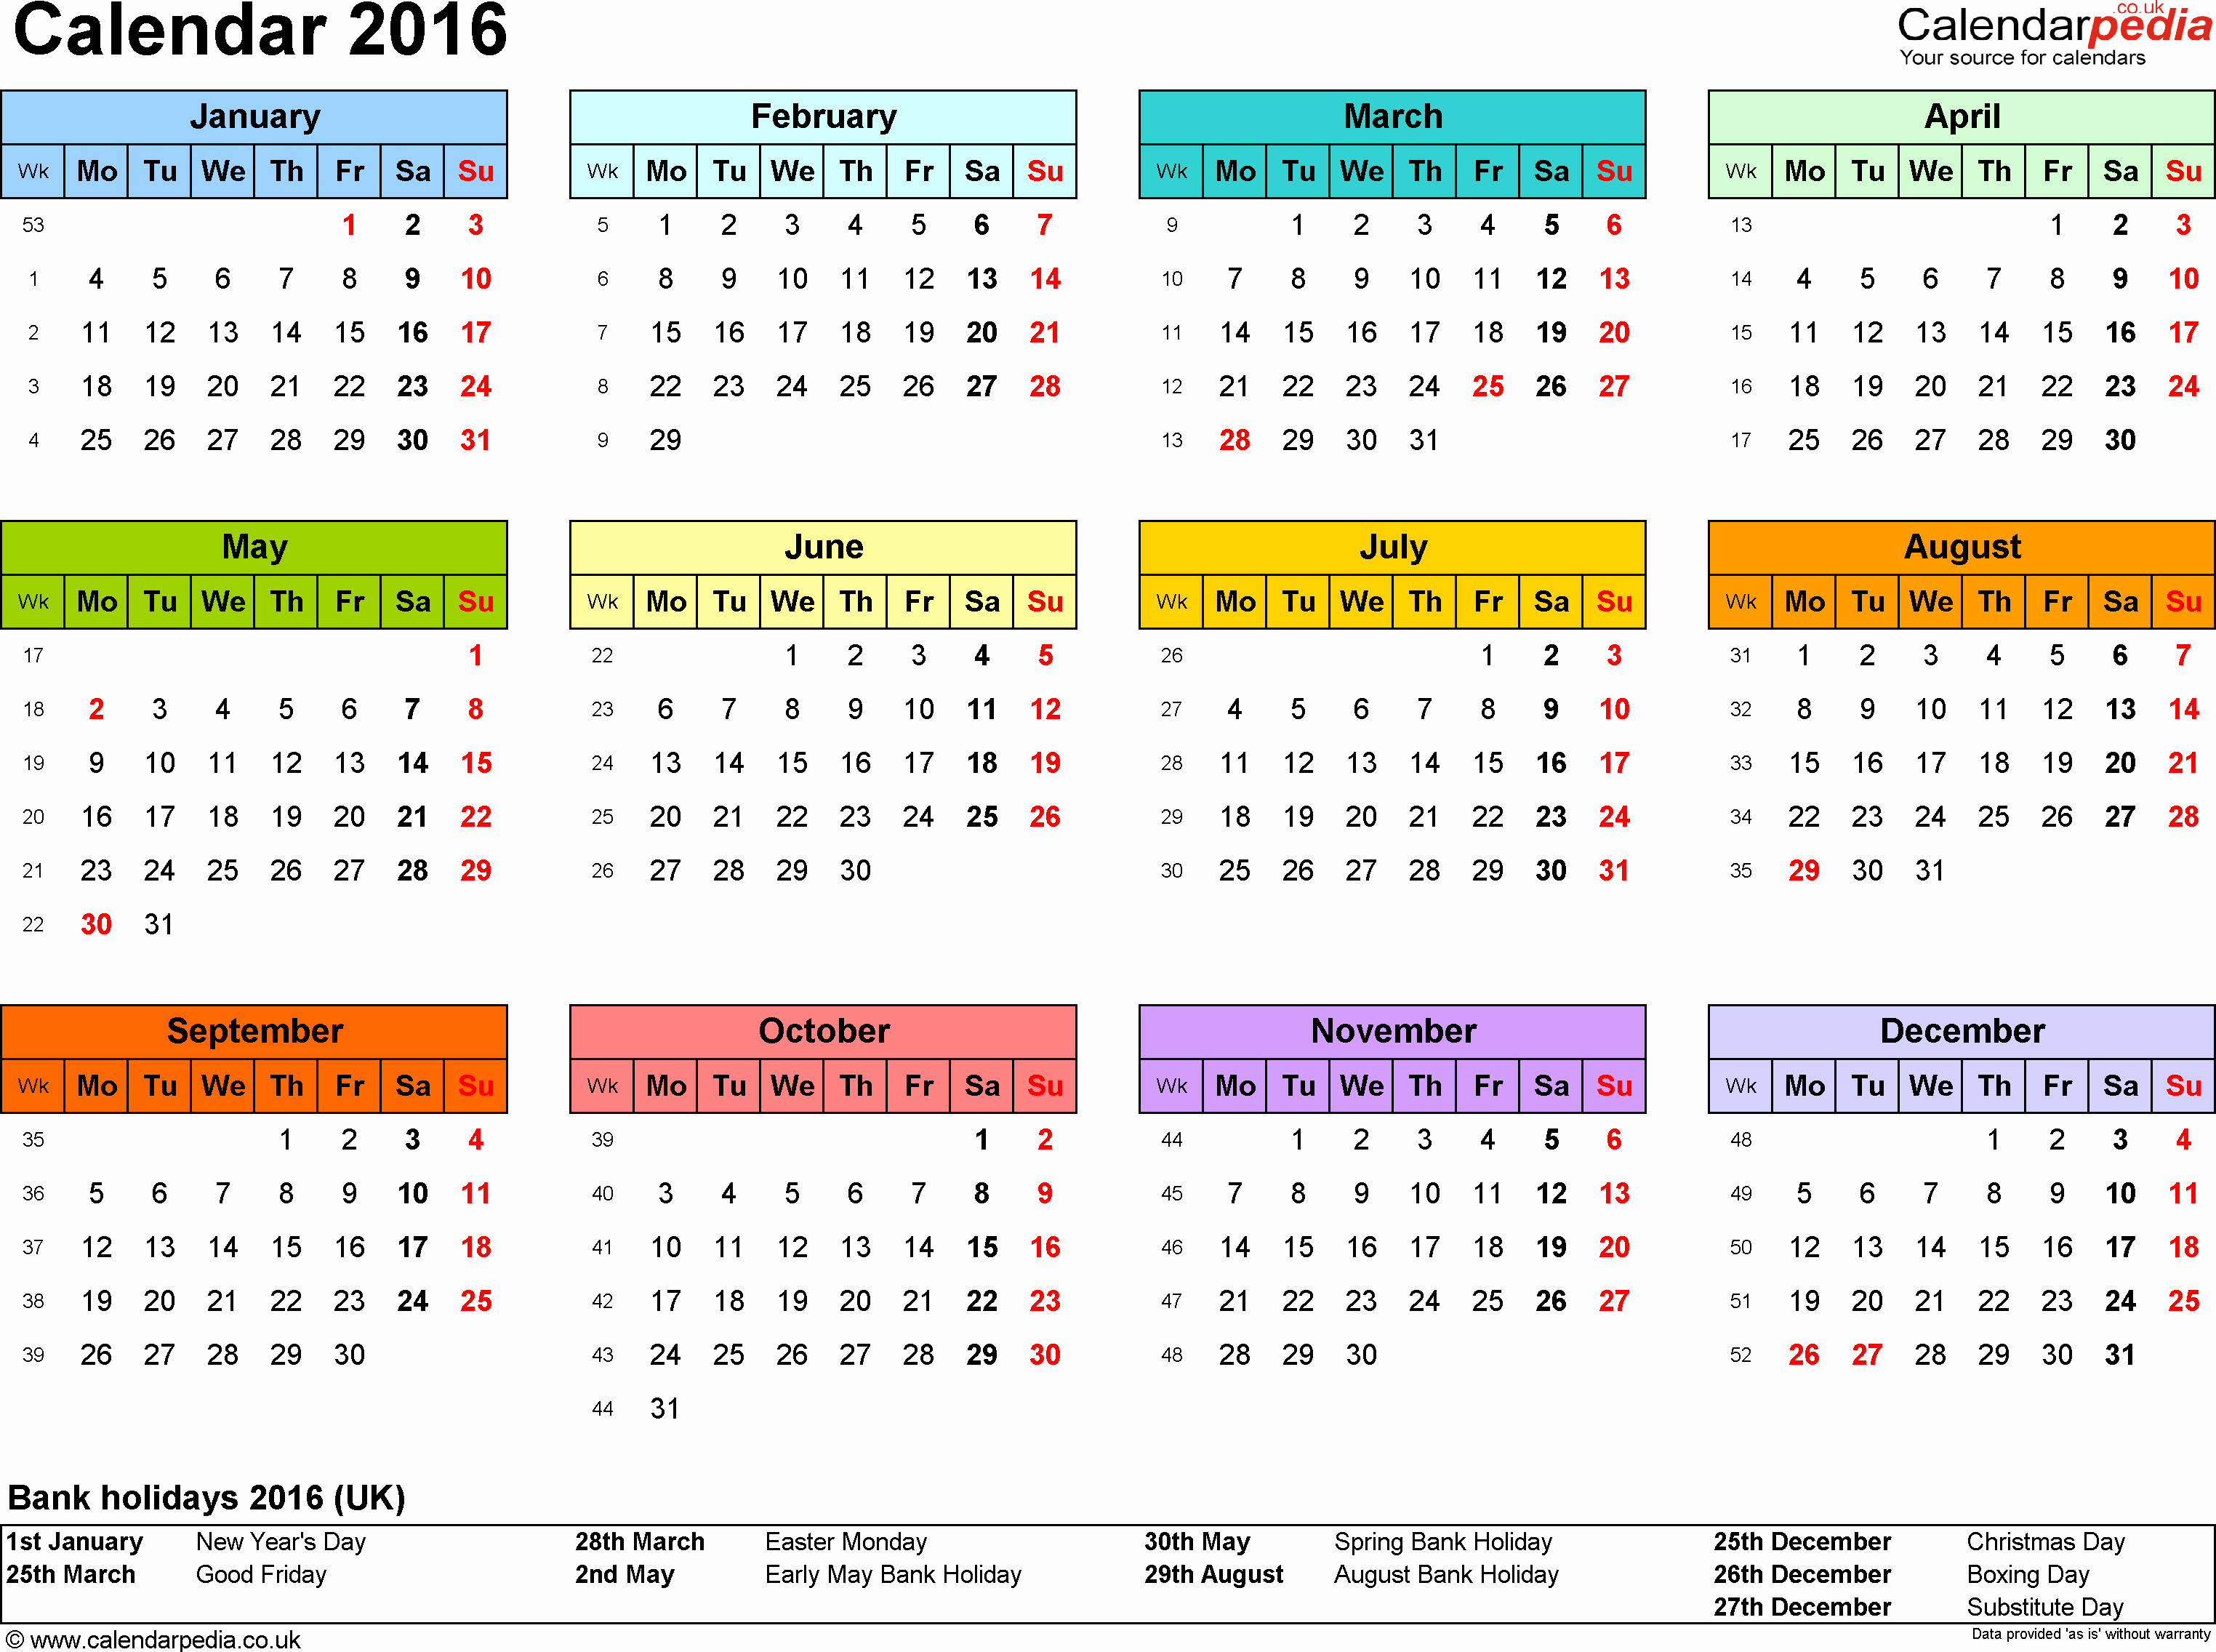 Excel 2016 Calendar with Holidays Inspirational Calendar 2016 Uk with Bank Holidays & Excel Pdf Word Templates